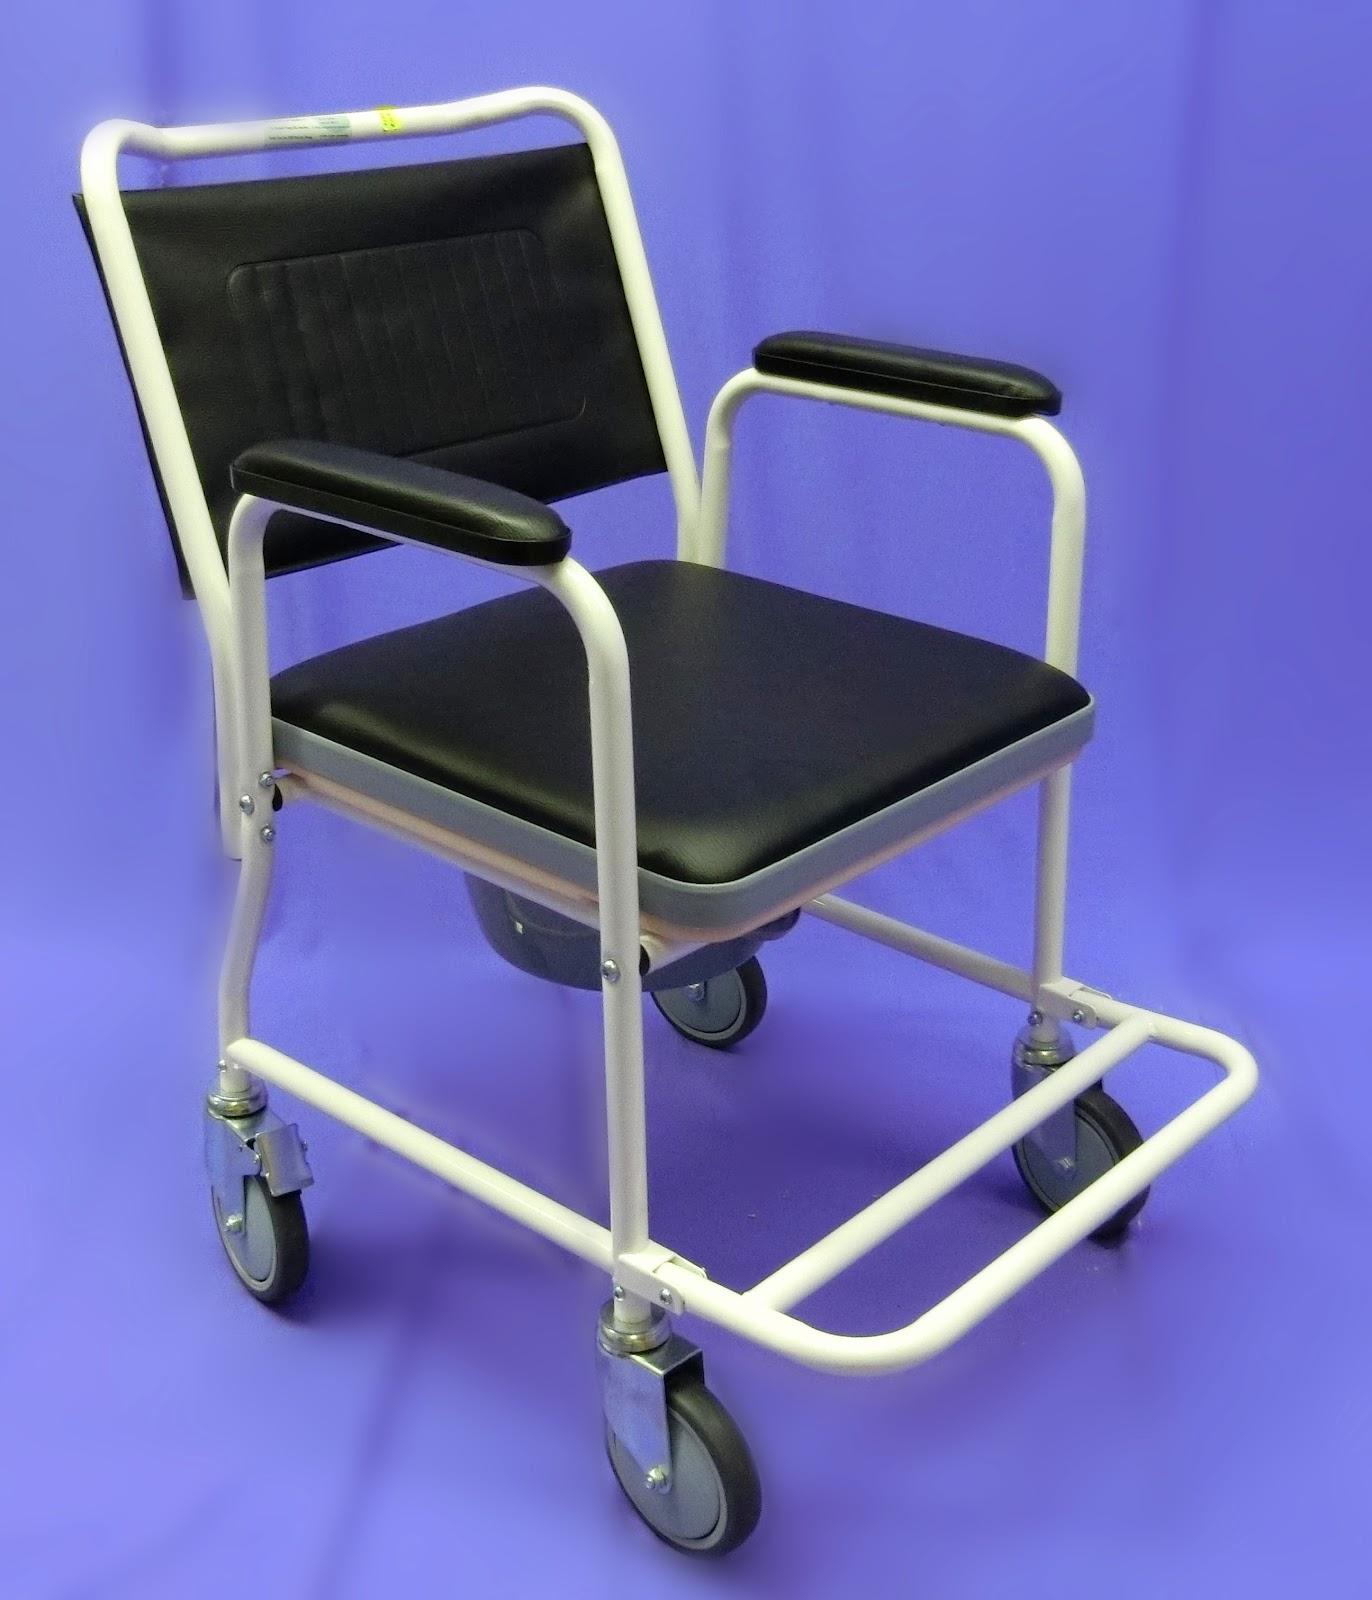 Shower Chair Malaysia Baby Feeding High In Sri Lanka Folding Foot Holder Commode Penang Kerusi